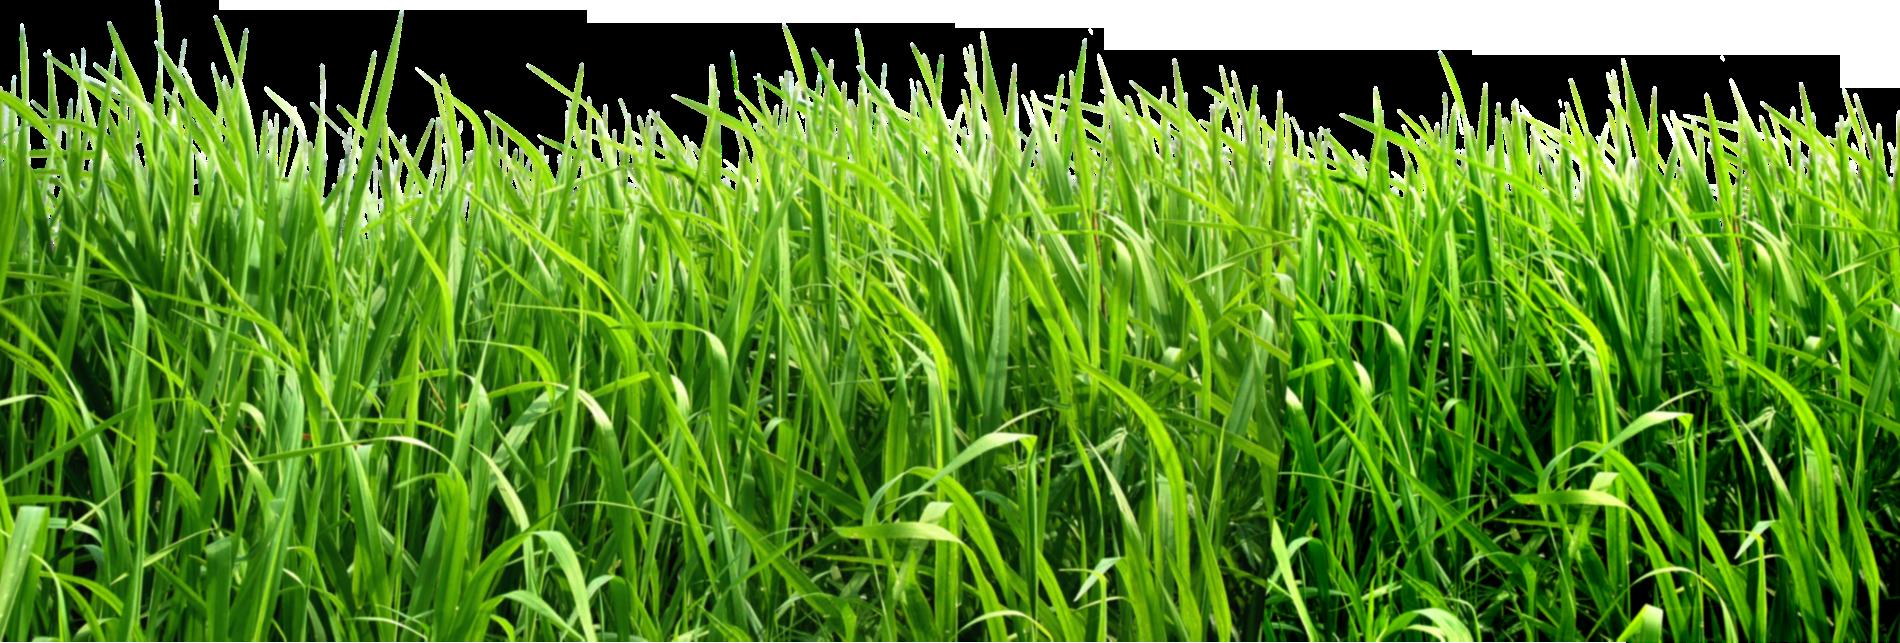 grass transparent background. Grass Png Image, Green PNG Picture Transparent Background